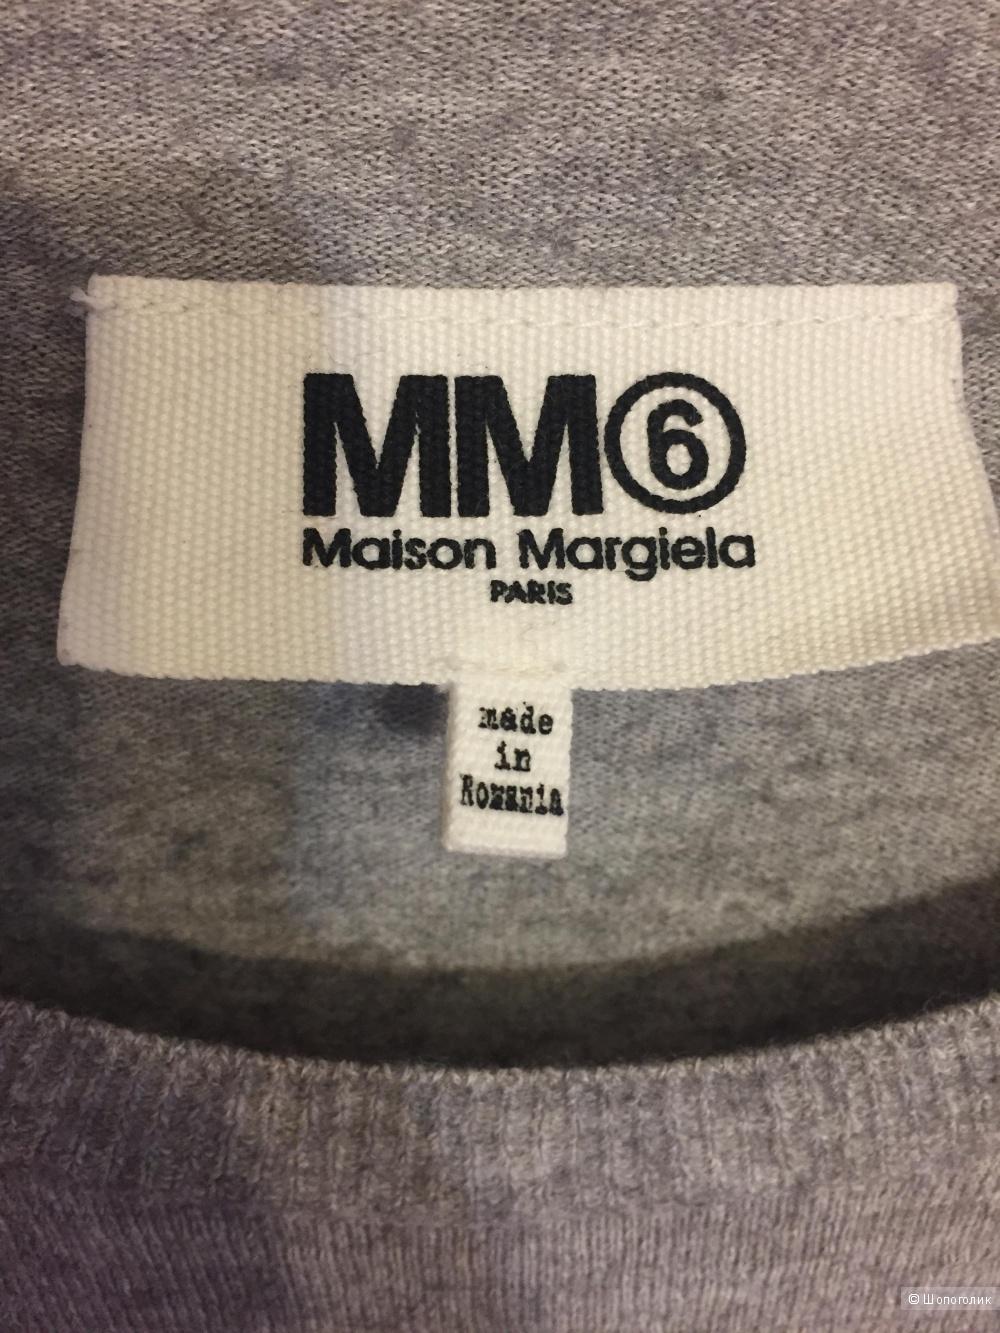 Свитер ММ6 by Maison Margiela, размер 46